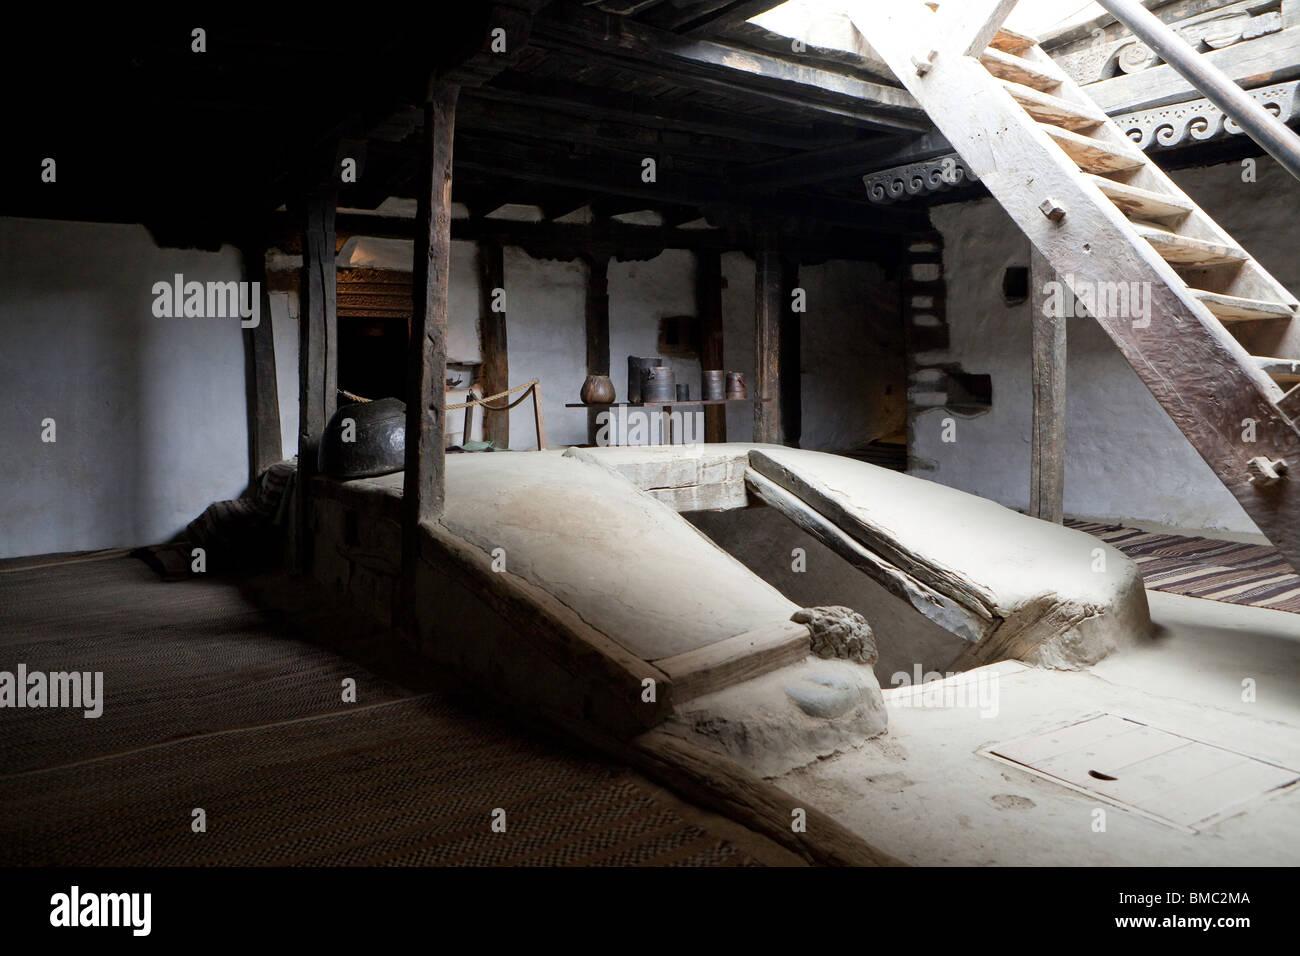 Inside Baltit Fort, Karimabad, Pakistan - Stock Image